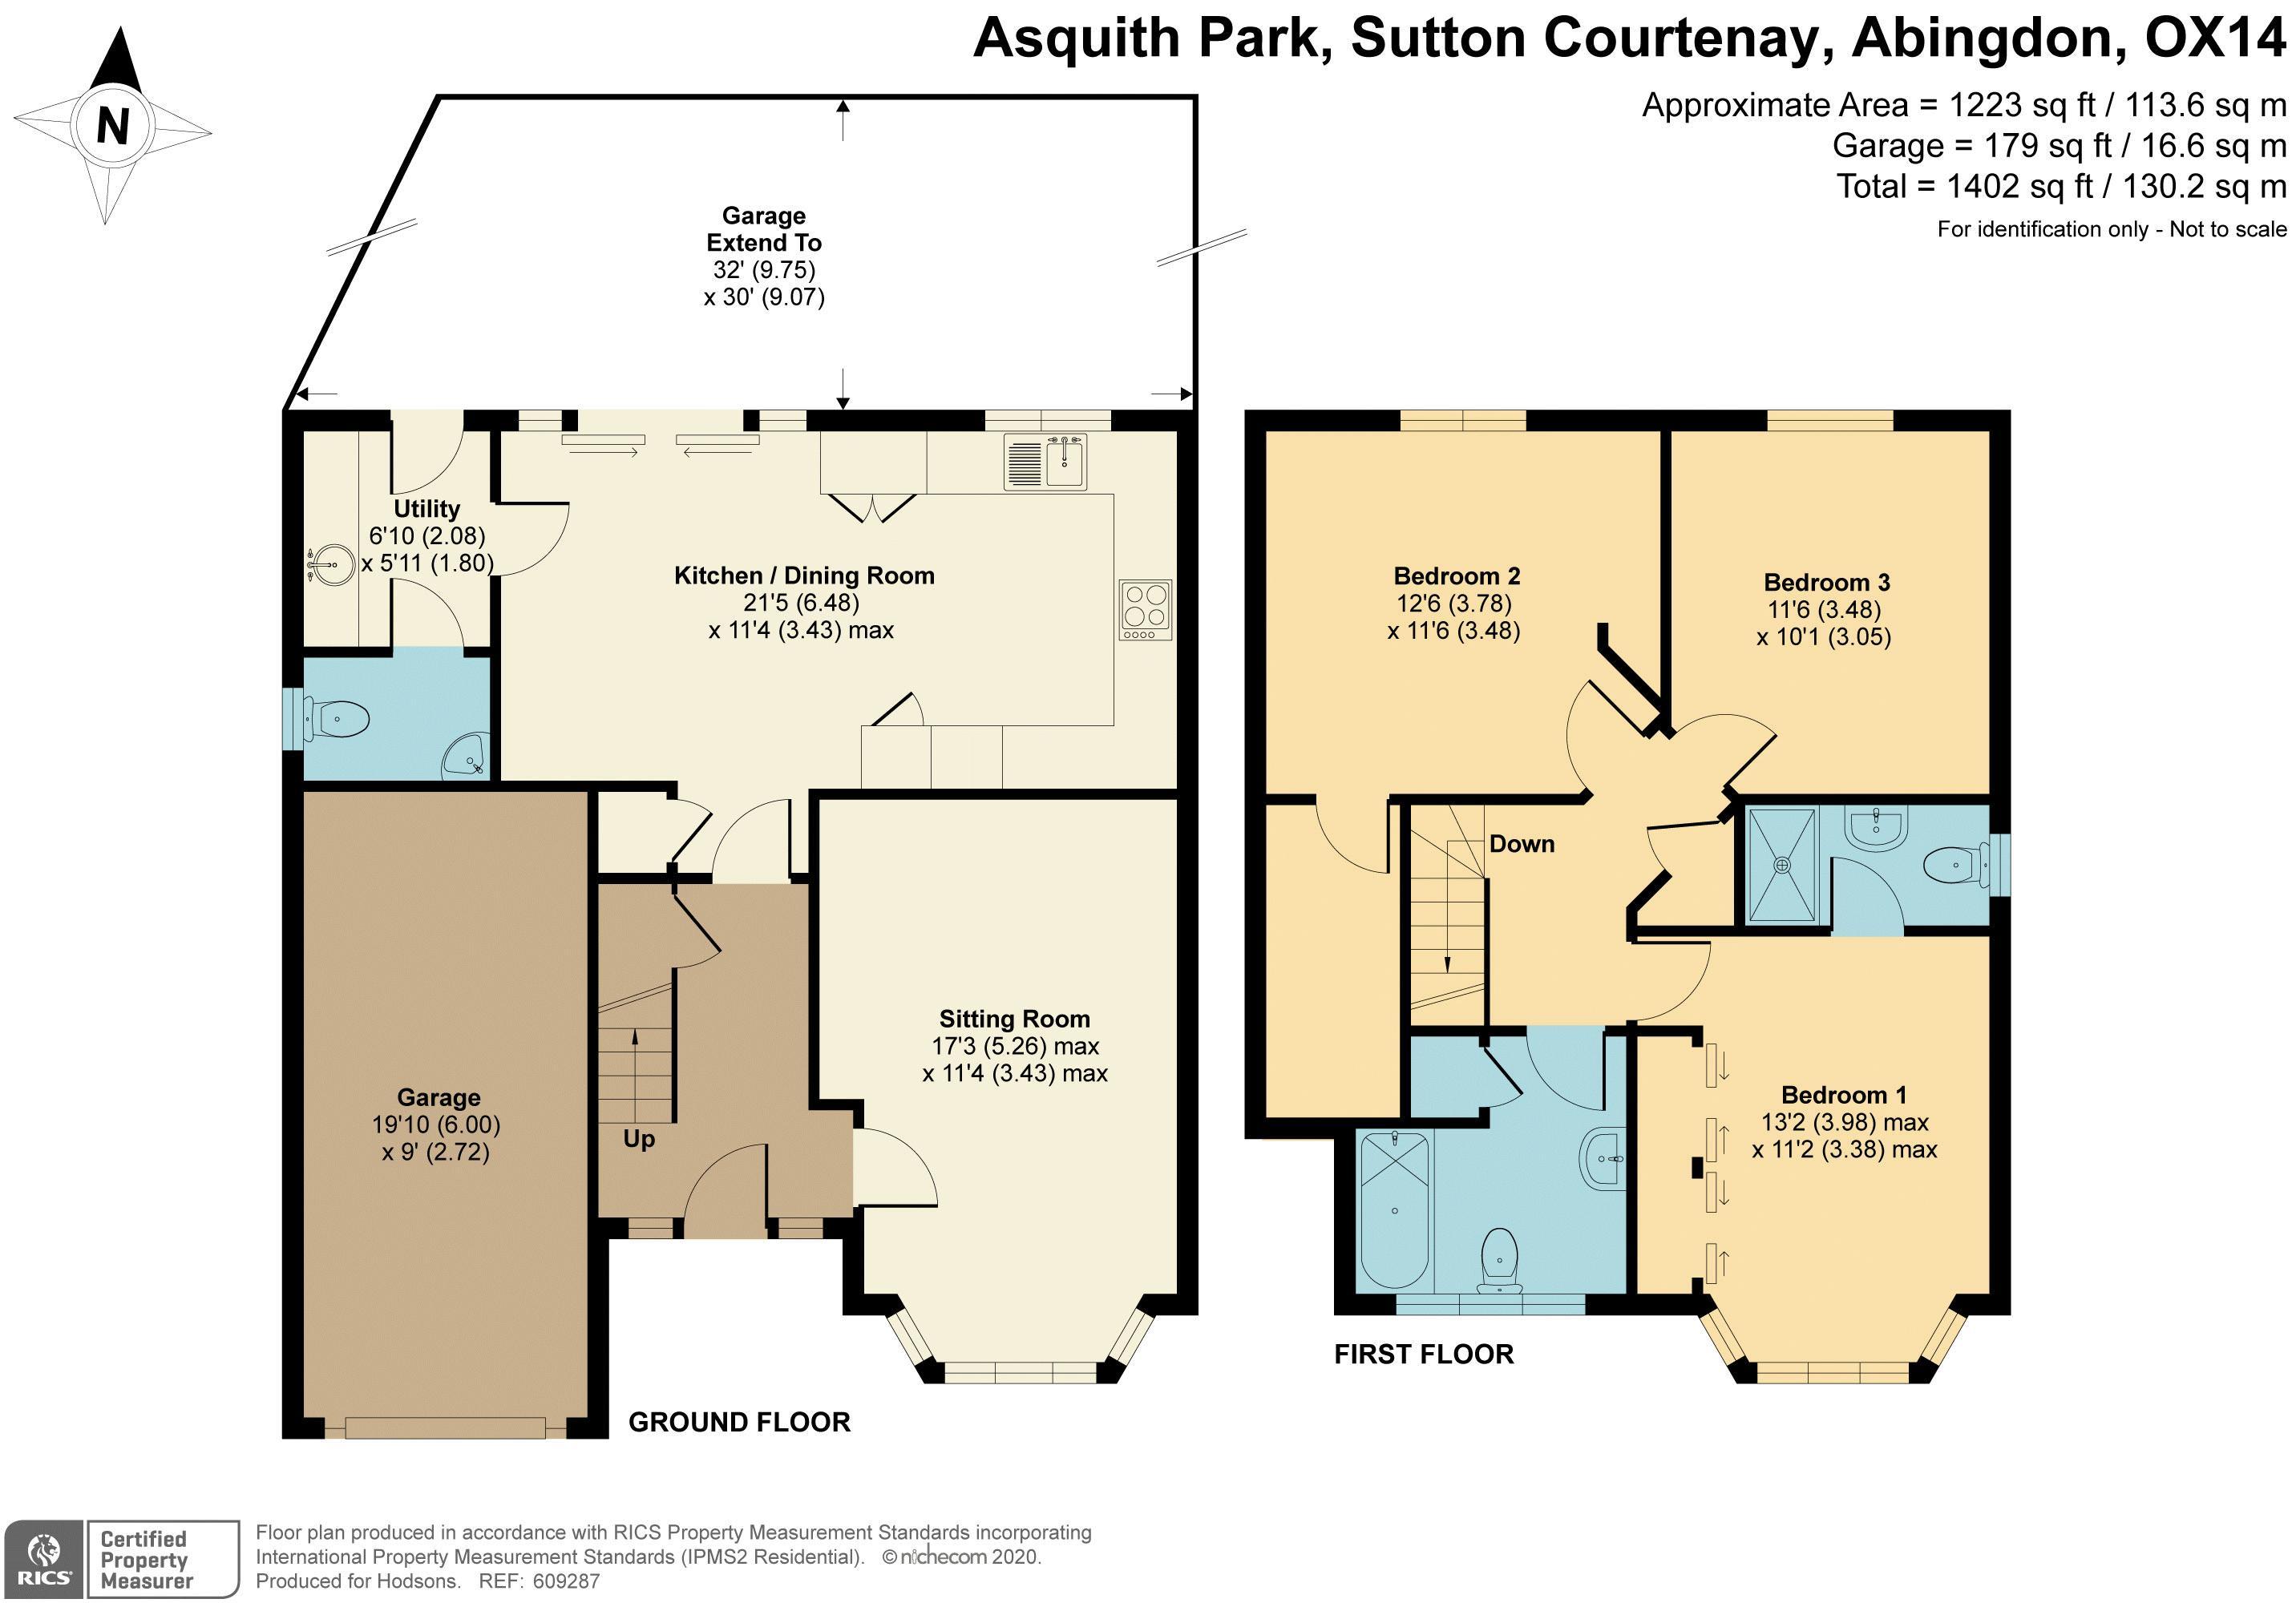 Asquith Park Sutton Courtenay